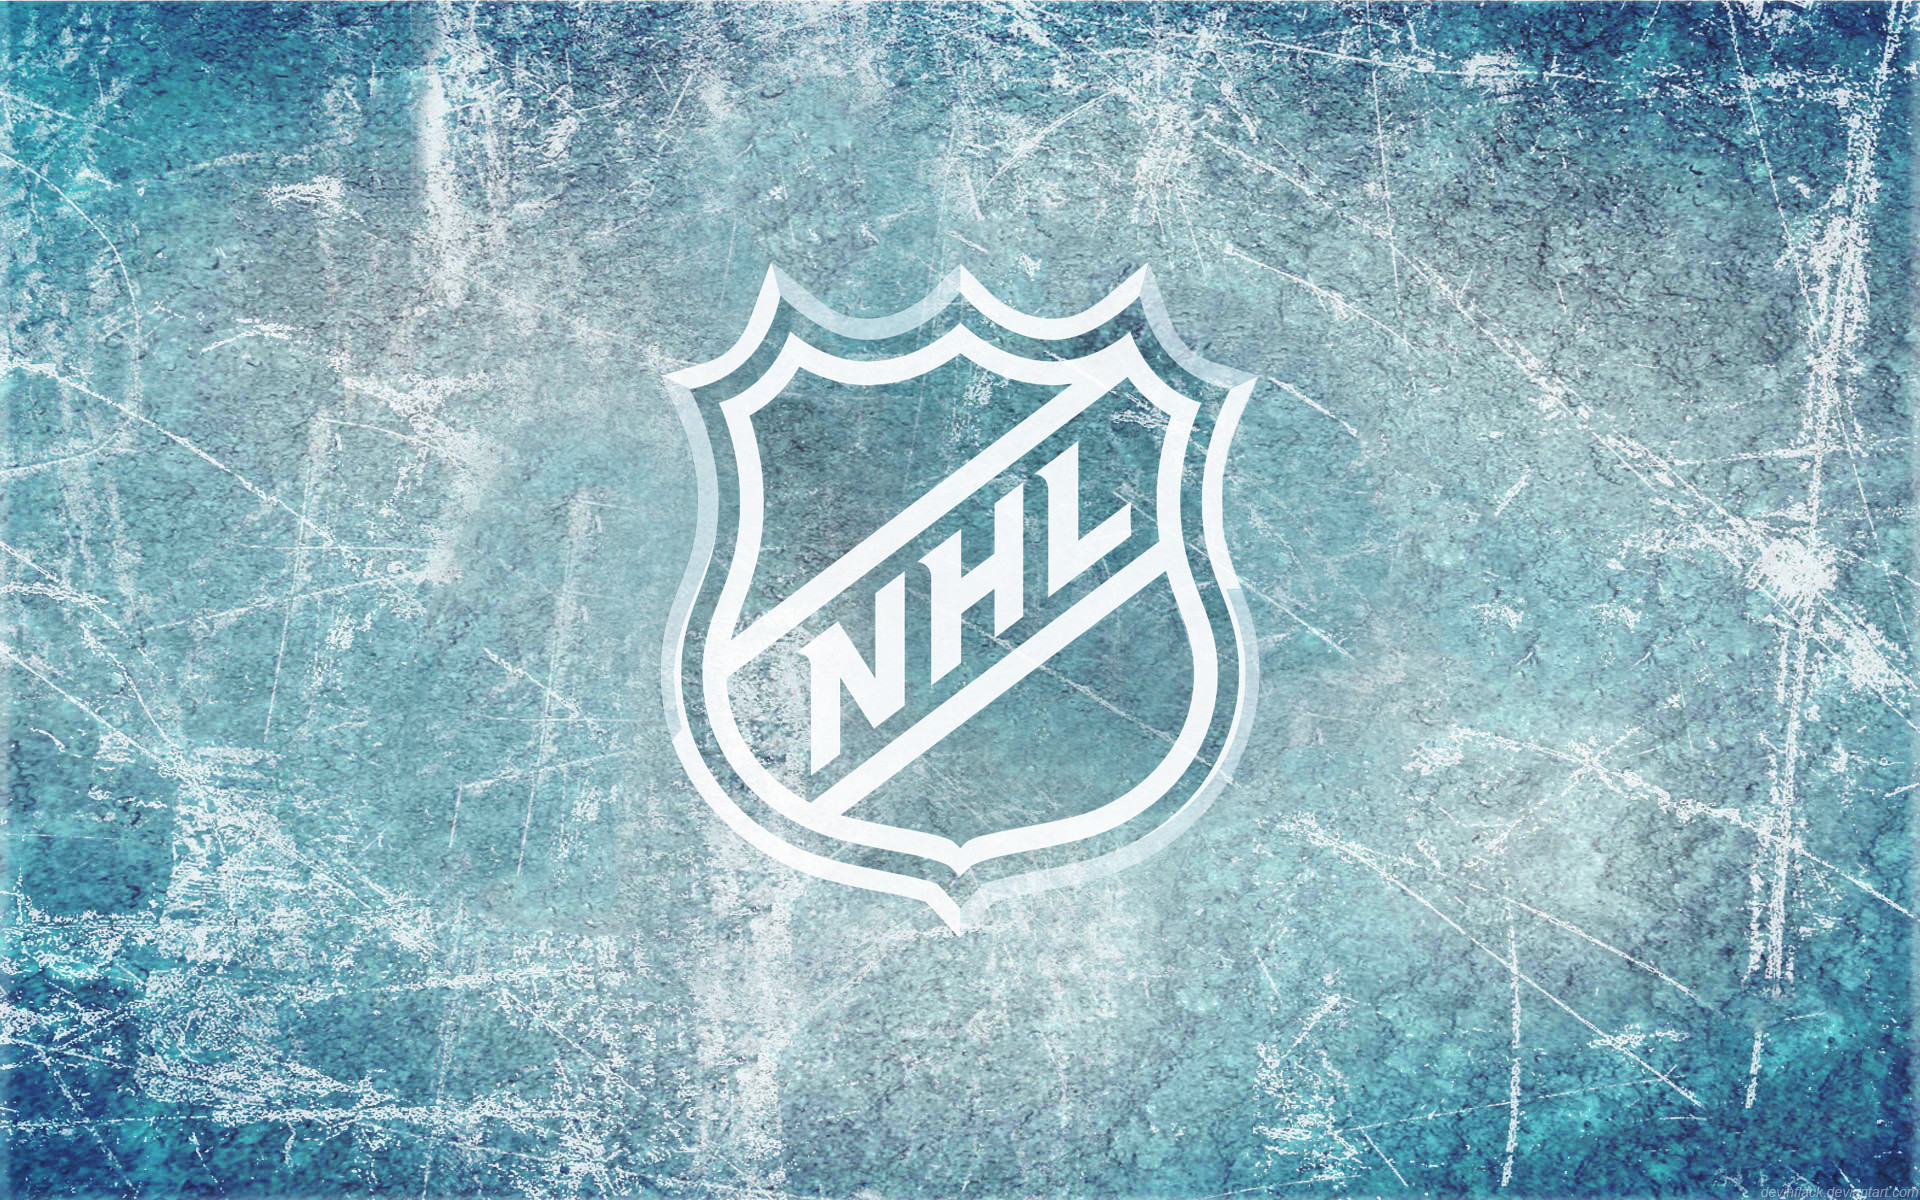 Res: 1920x1200, Best Hockey Apps For iPhone 5s mobilecrazies